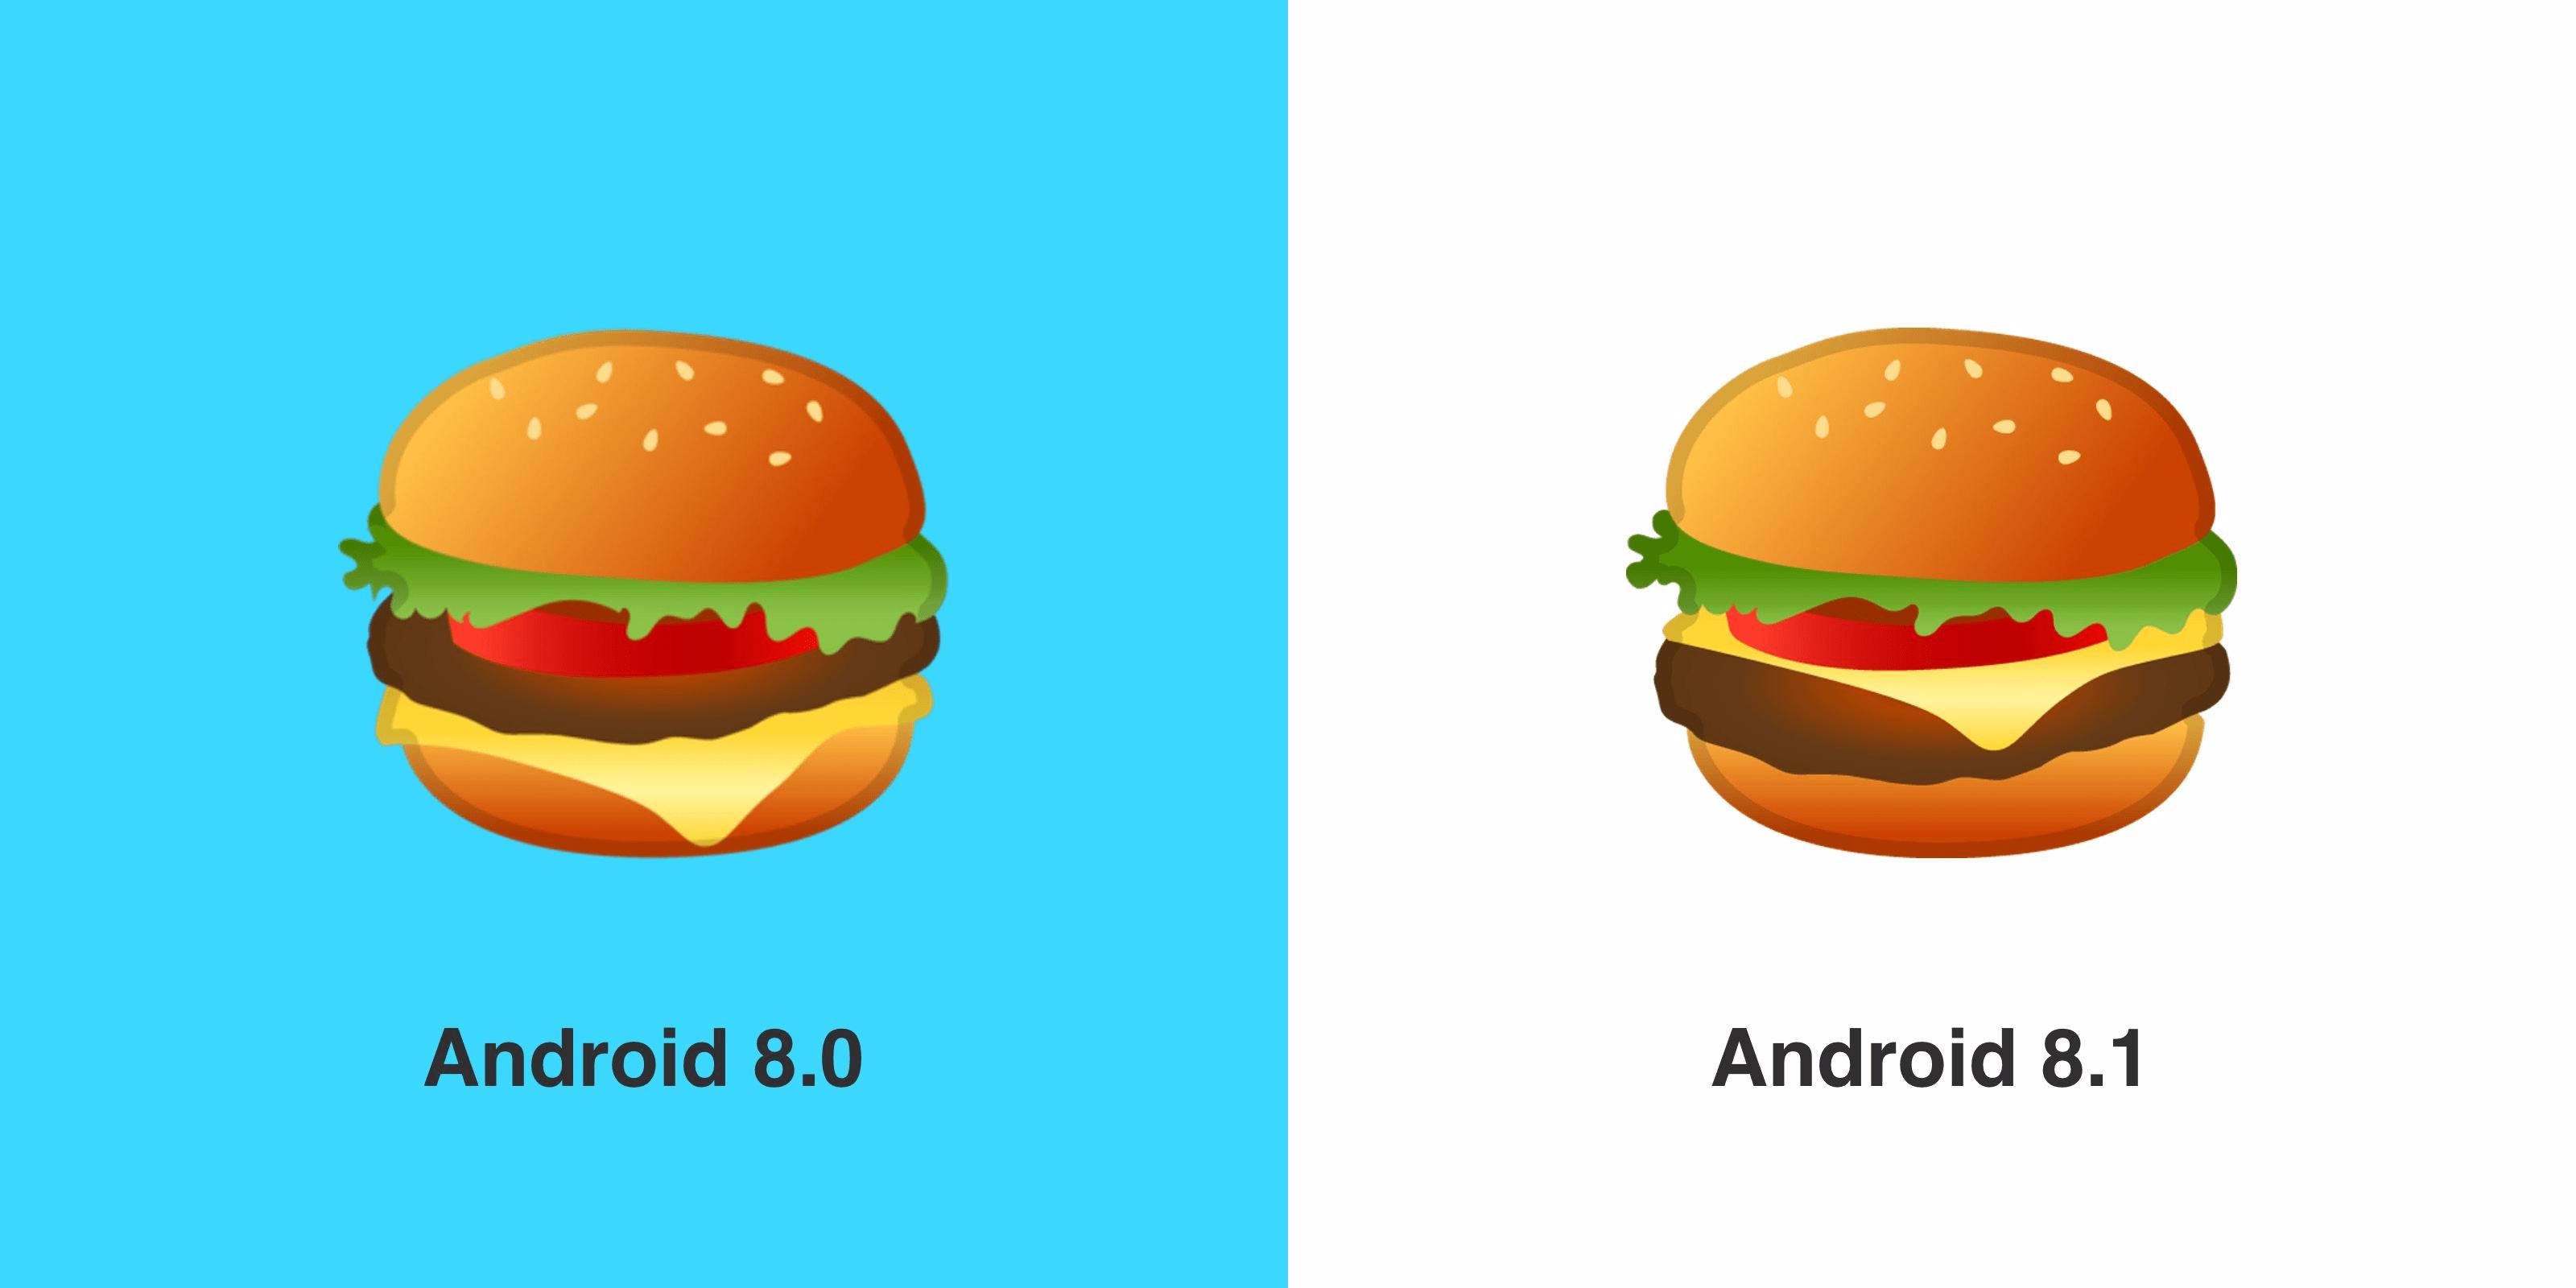 Le monde est sauf, Android 8.1 Oreo corrige ses émojis